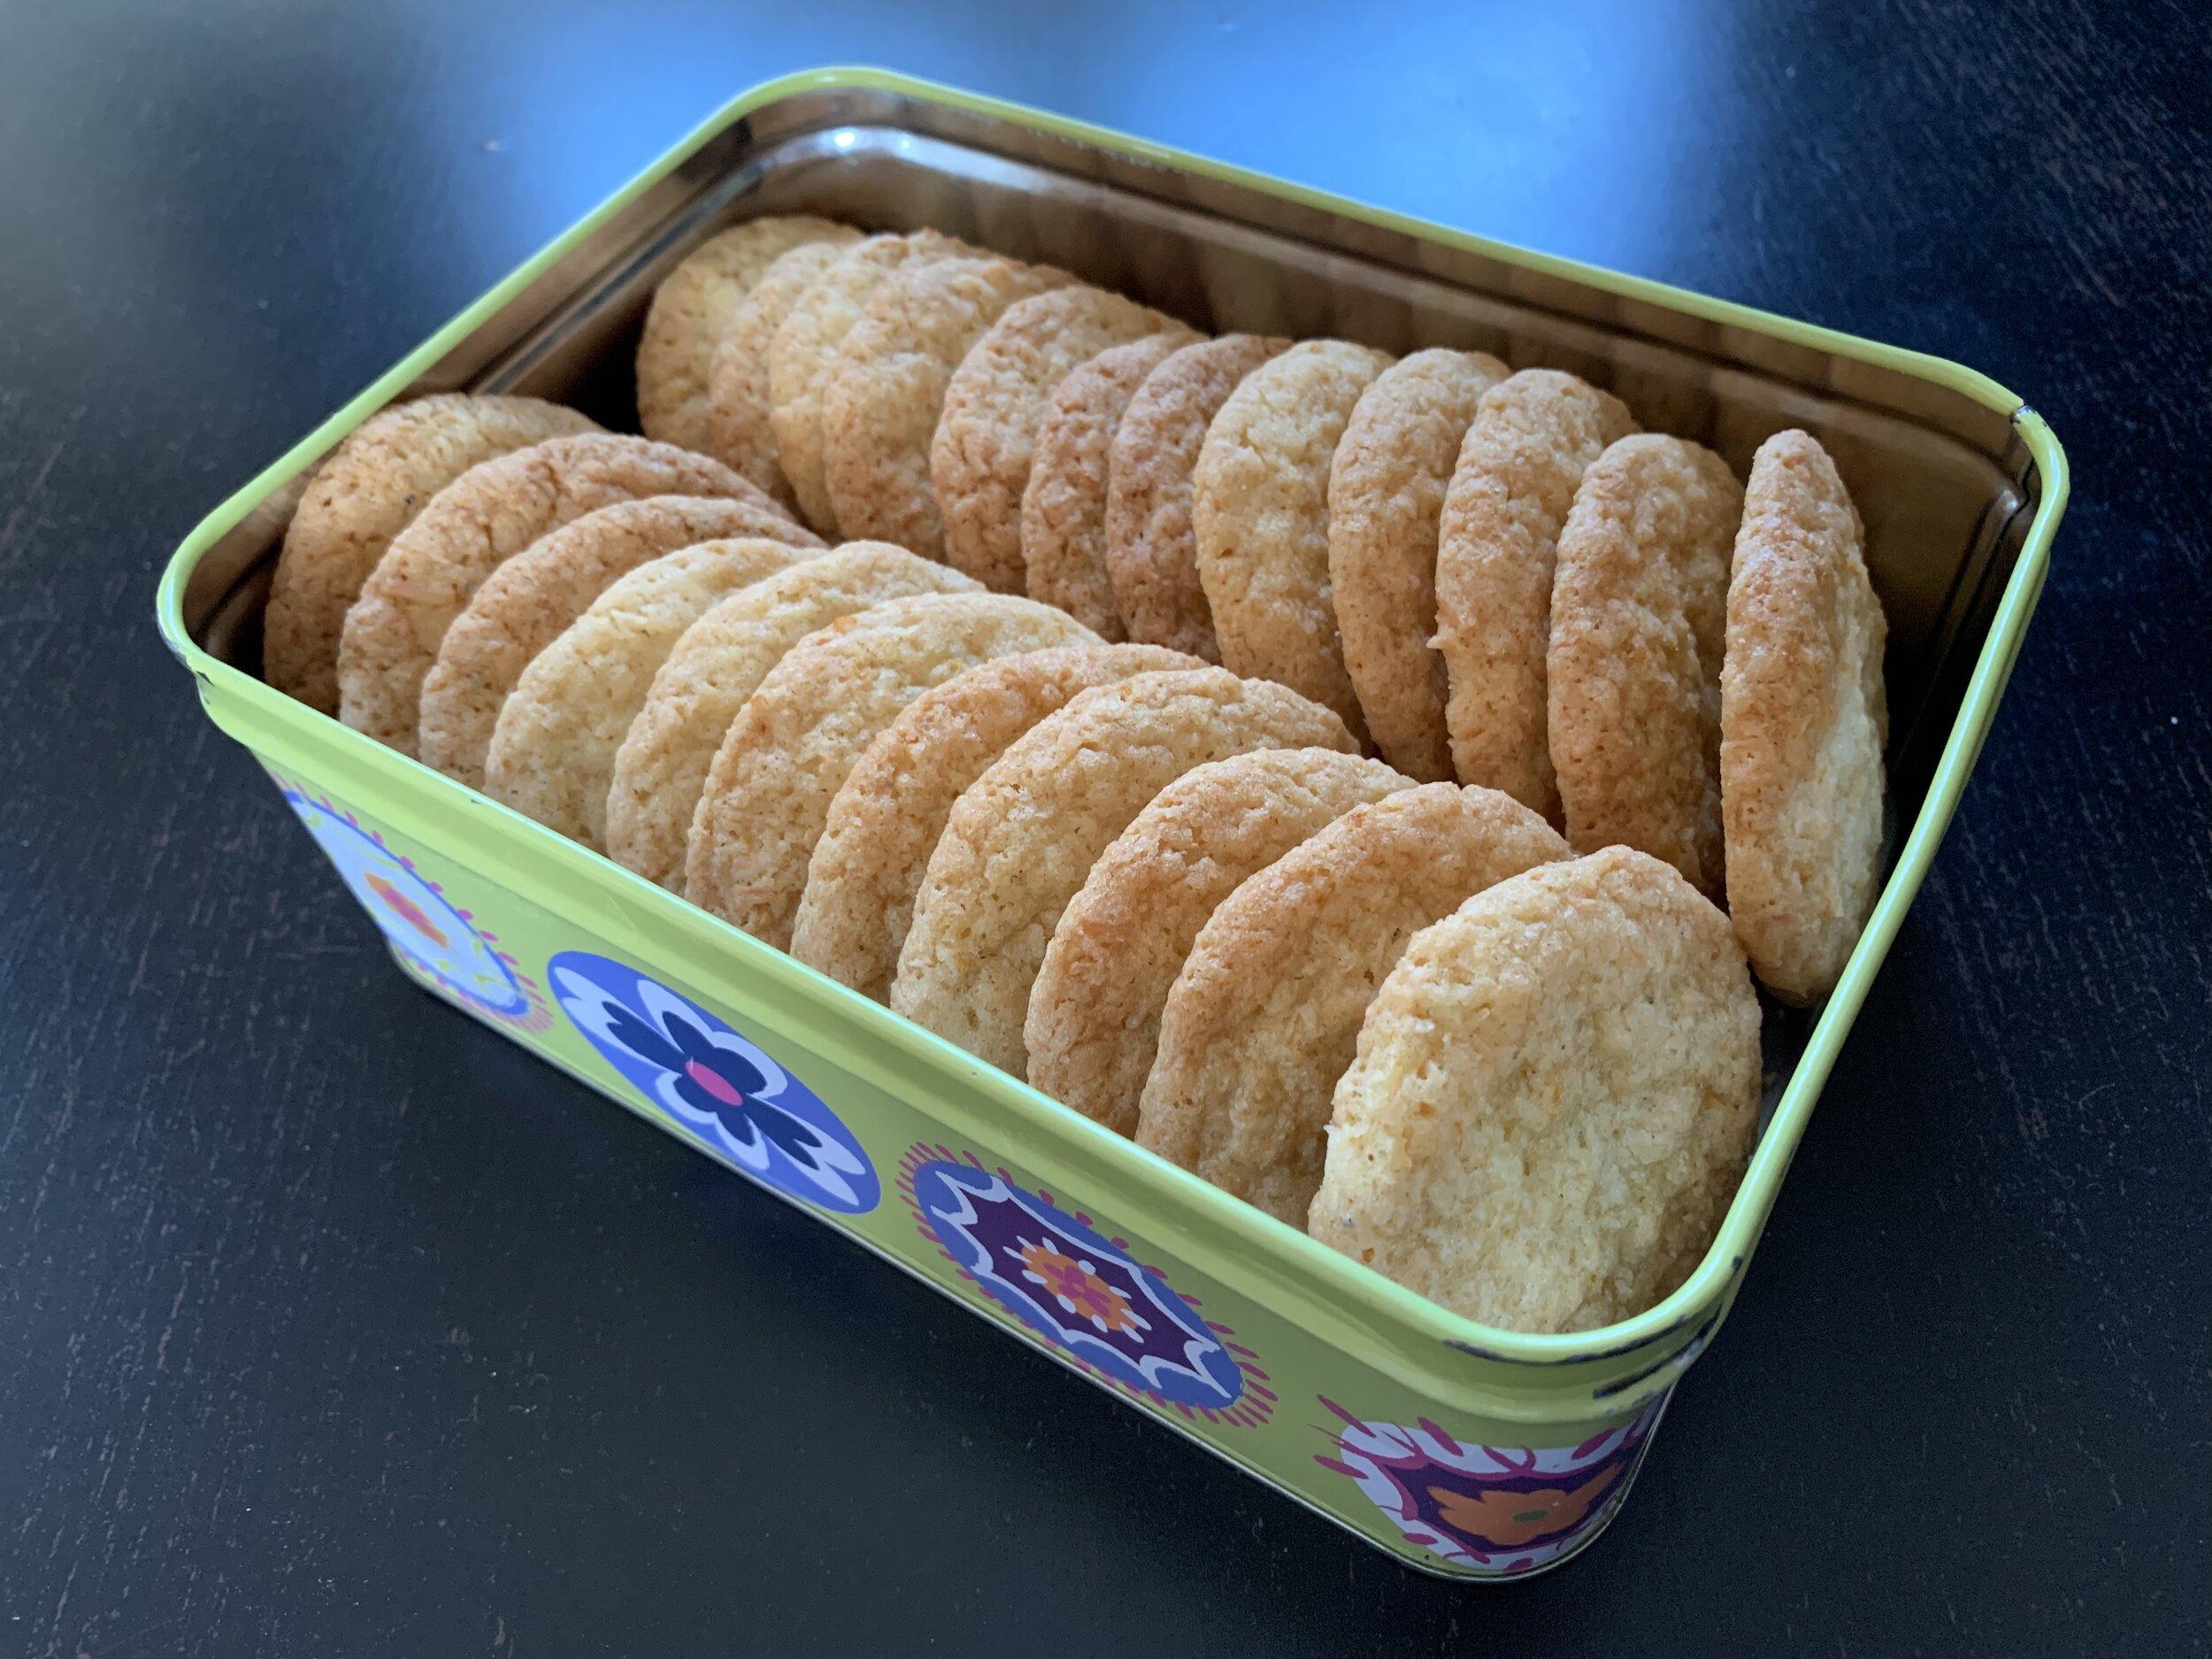 Orange lemon coconut biscuits